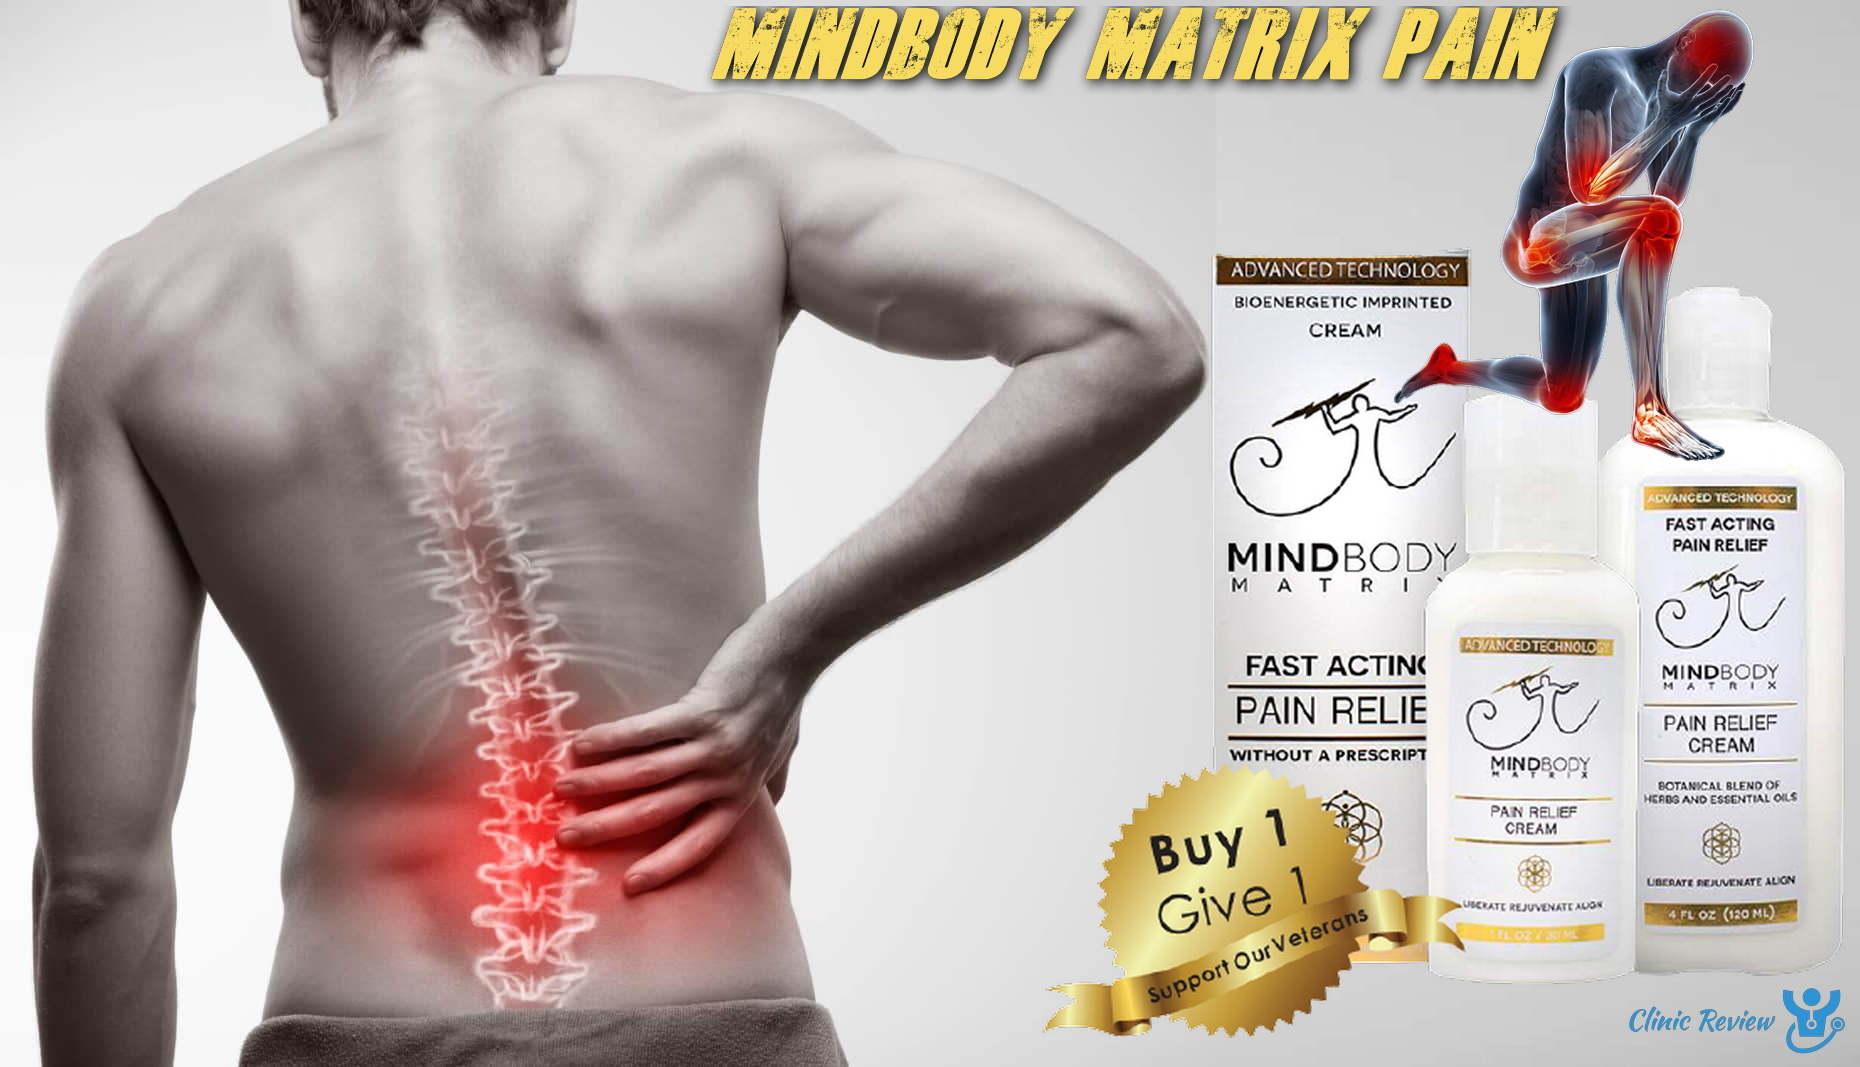 MindBody Matrix Pain Cream Reviews